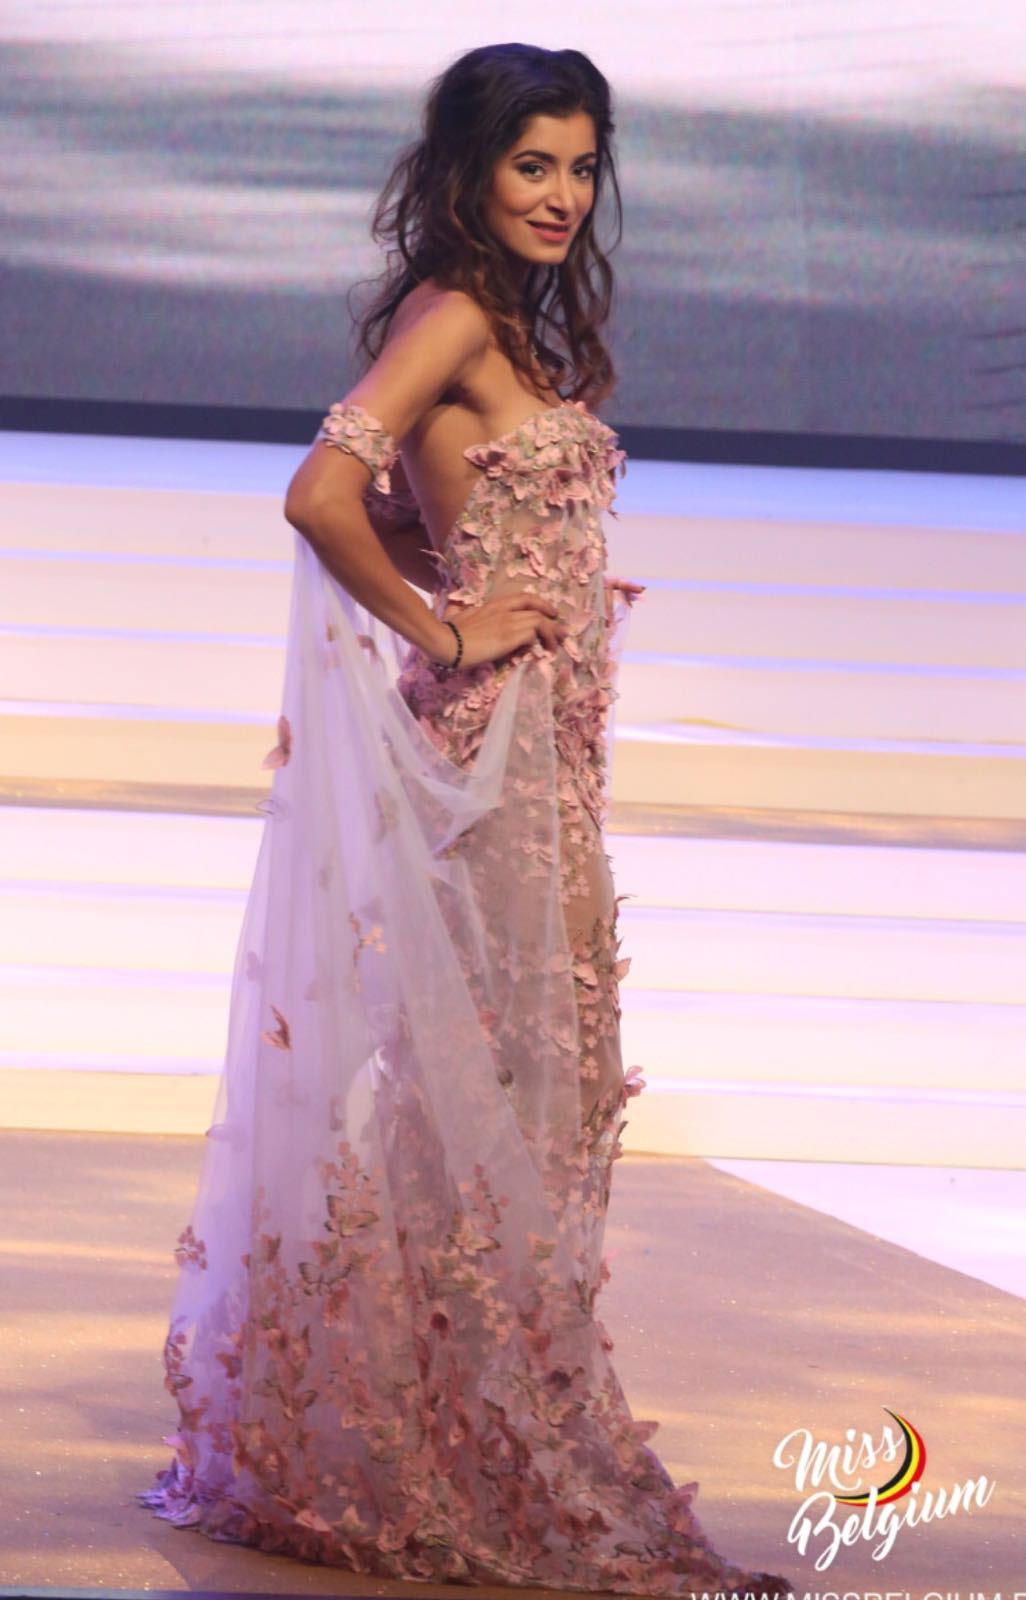 Custom design for Shakila, one of Miss Belgium's finalists in 2017, standing sideways.